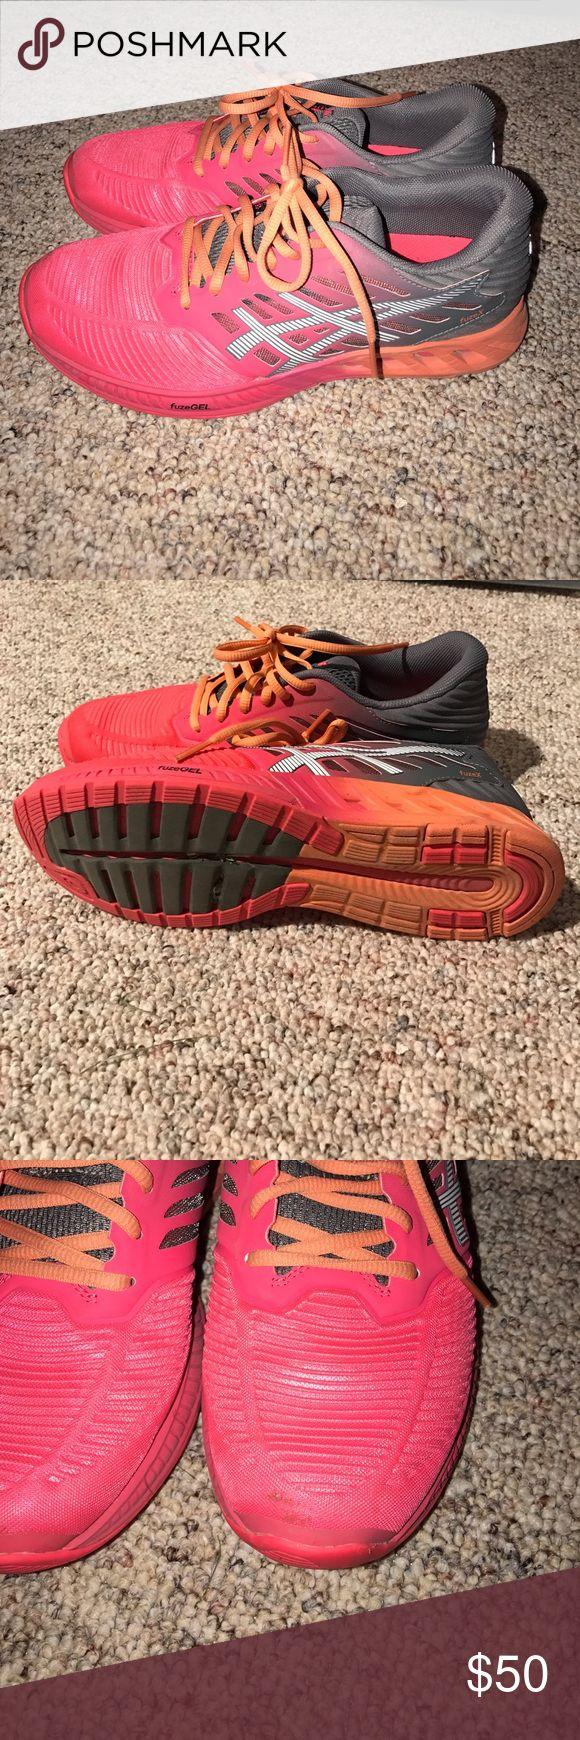 Selling this Asics coral and grey tennis shoes on Poshmark! My username is: jayhawko. #shopmycloset #poshmark #fashion #shopping #style #forsale #Asics #Shoes